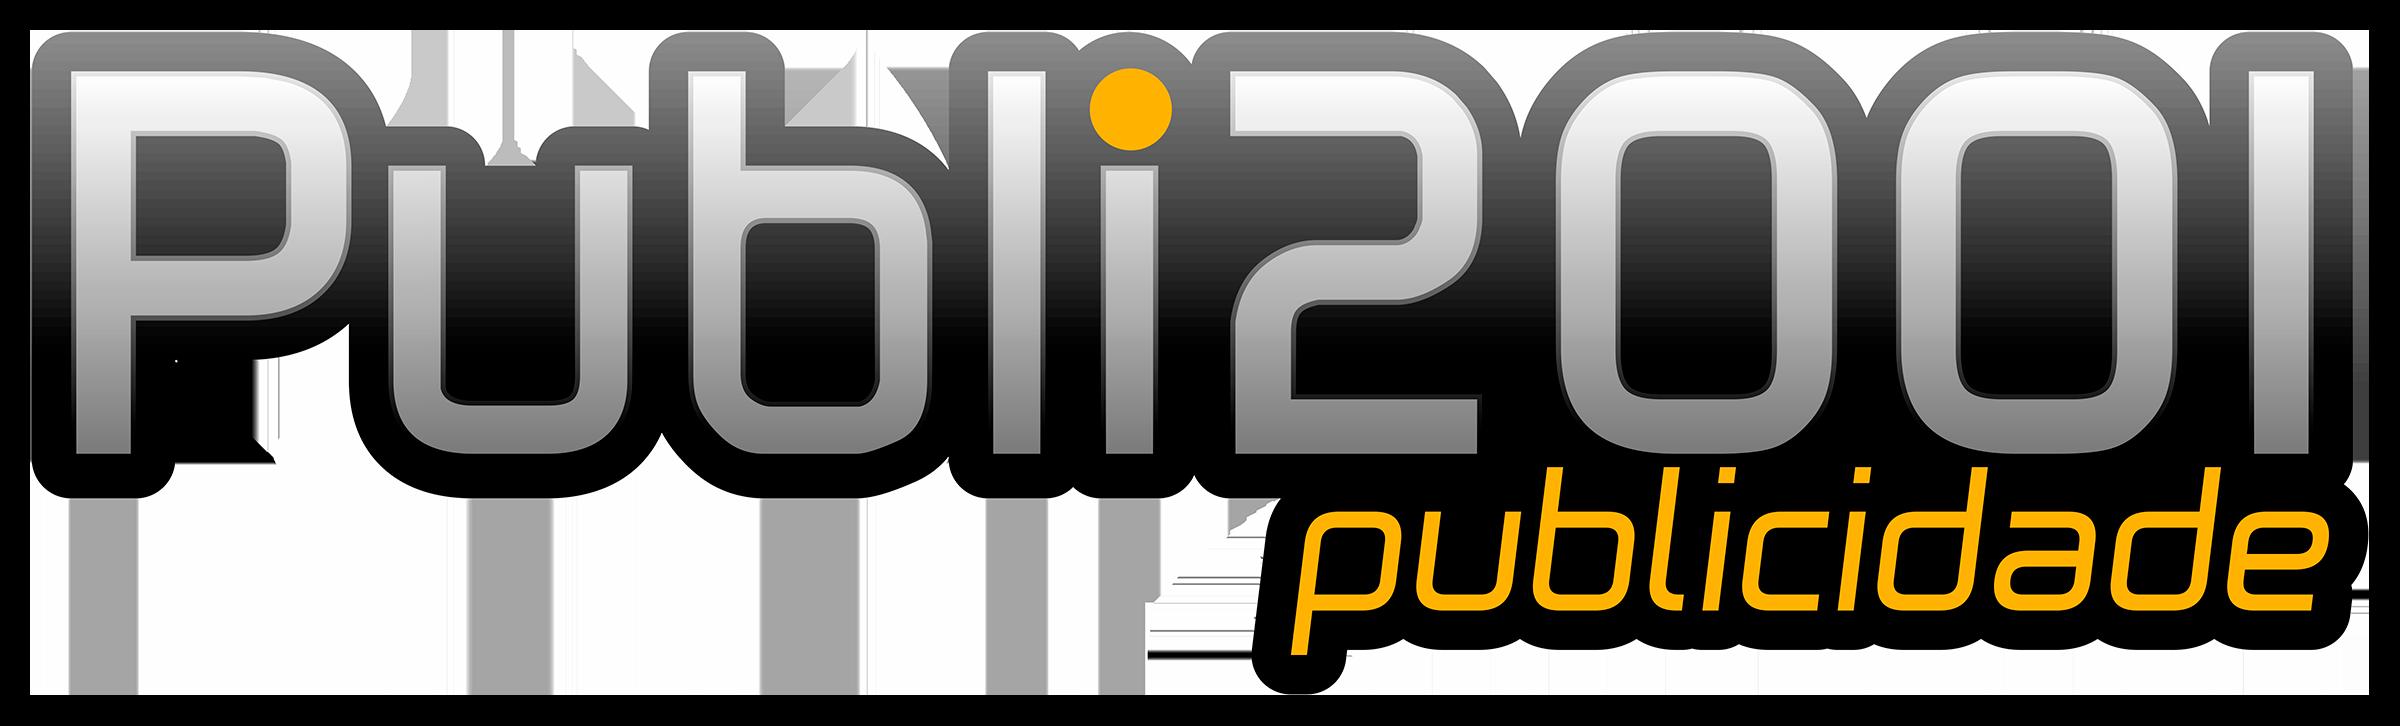 publi2001 menu